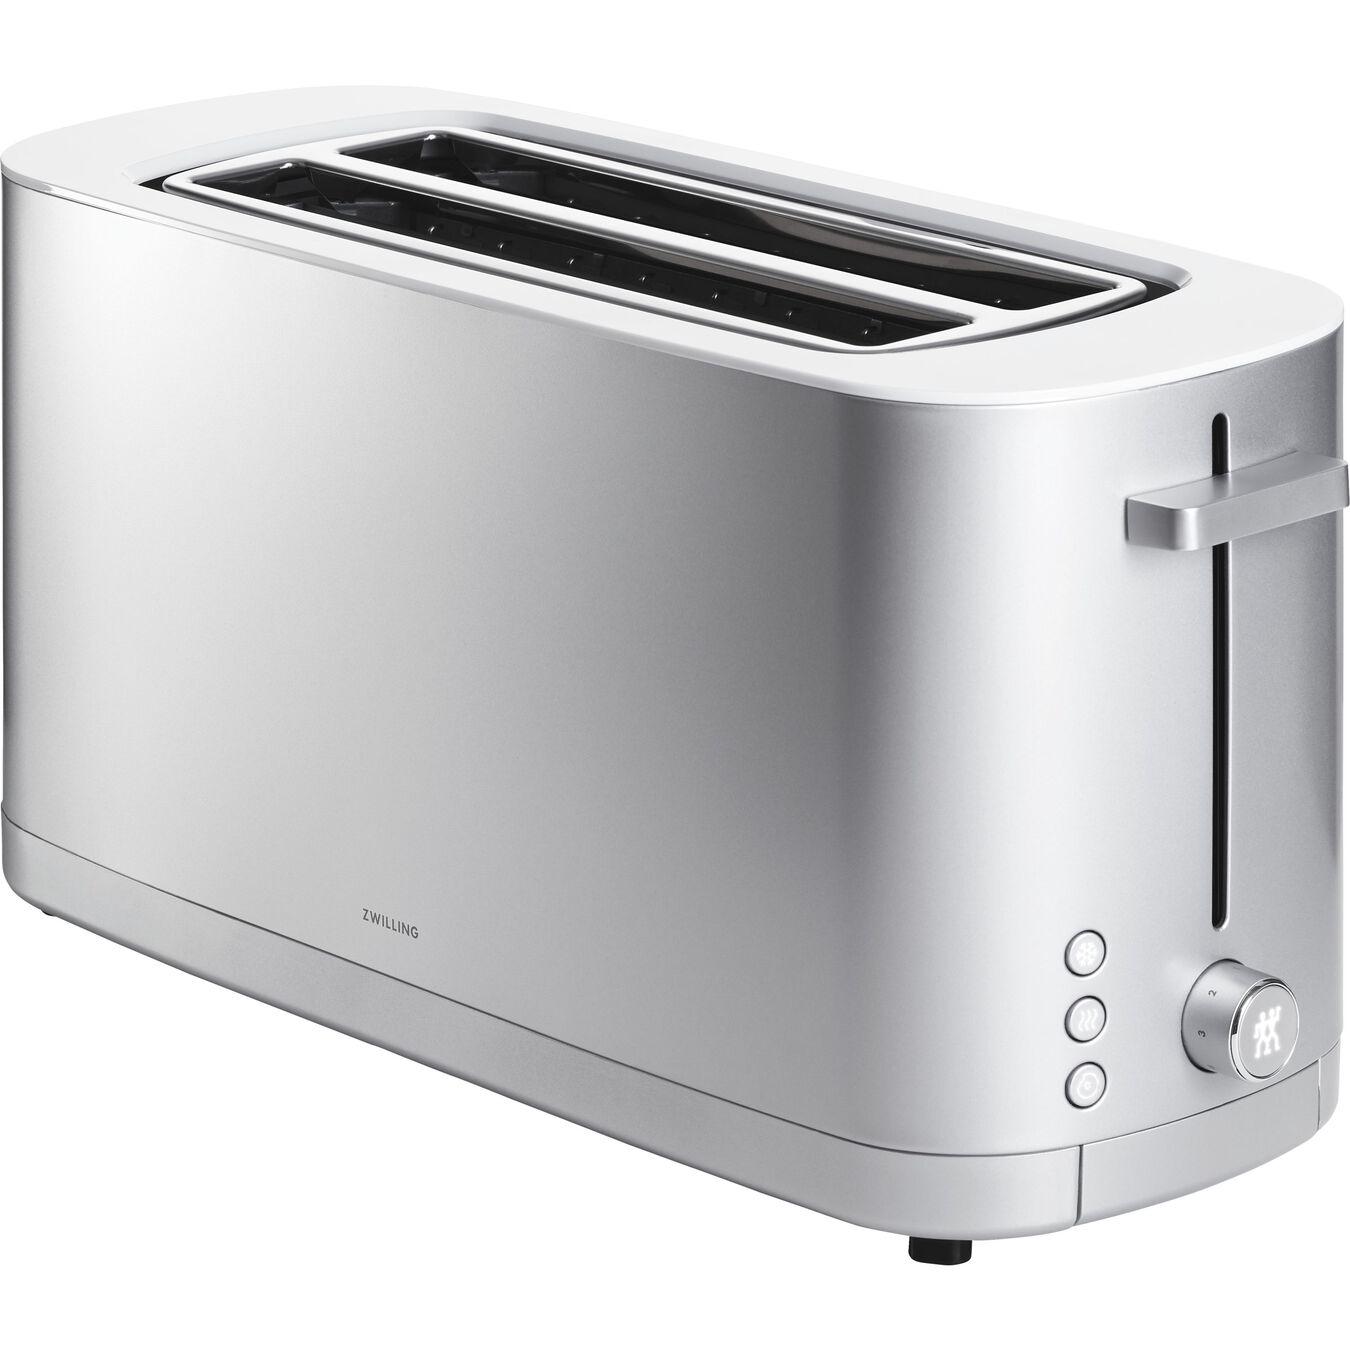 Toaster, 2 Schlitze lang, Silber,,large 1